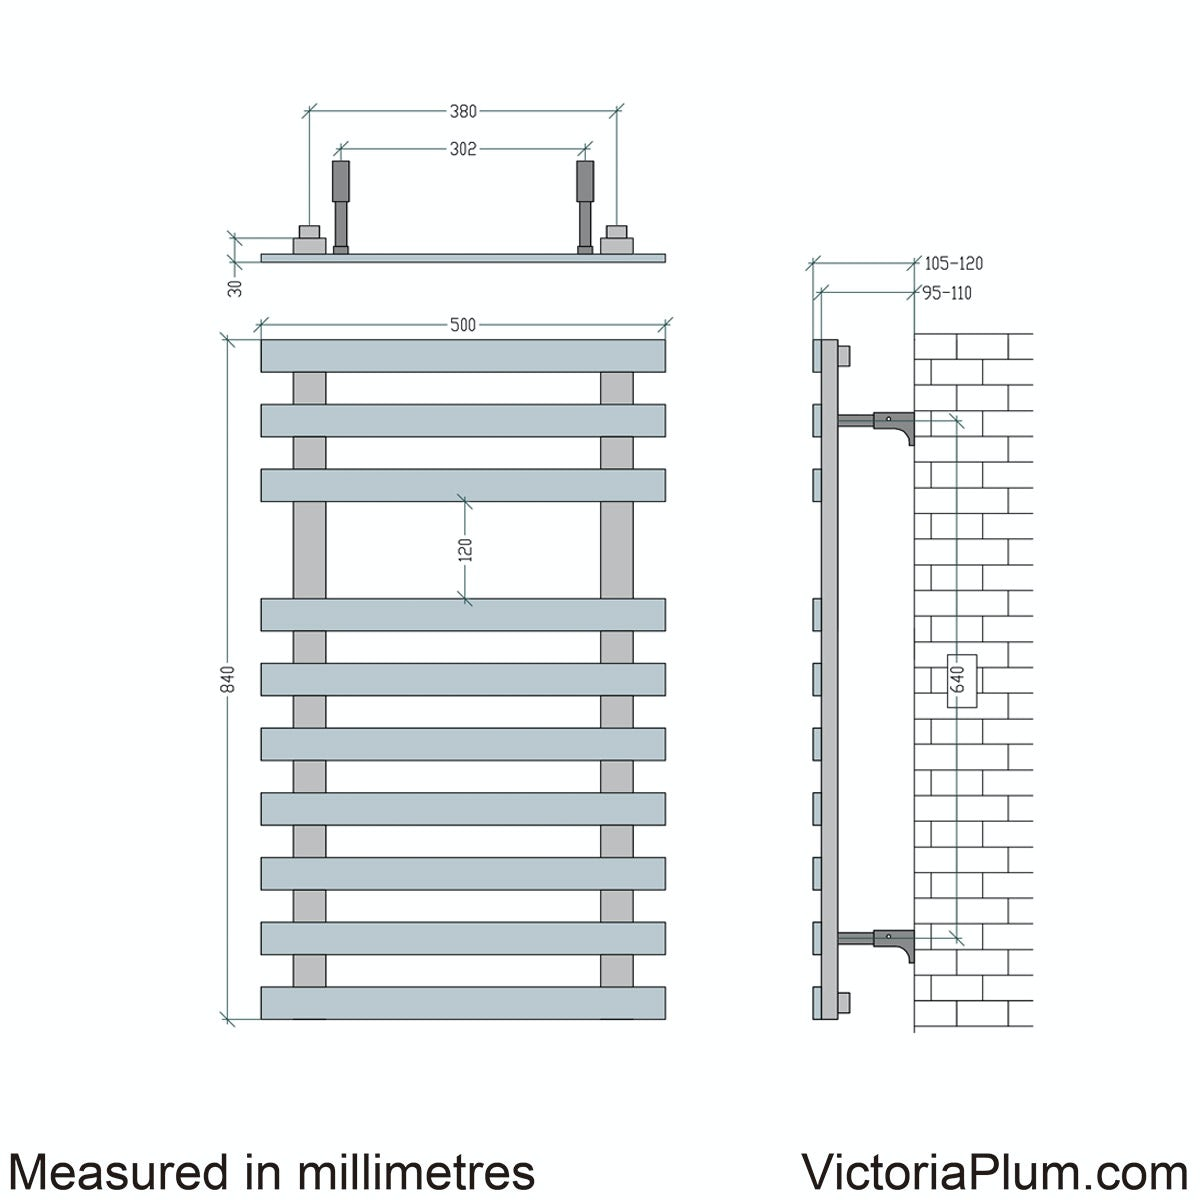 Dimensions for Mode Daisy 10 bar heated towel rail 840 x 500